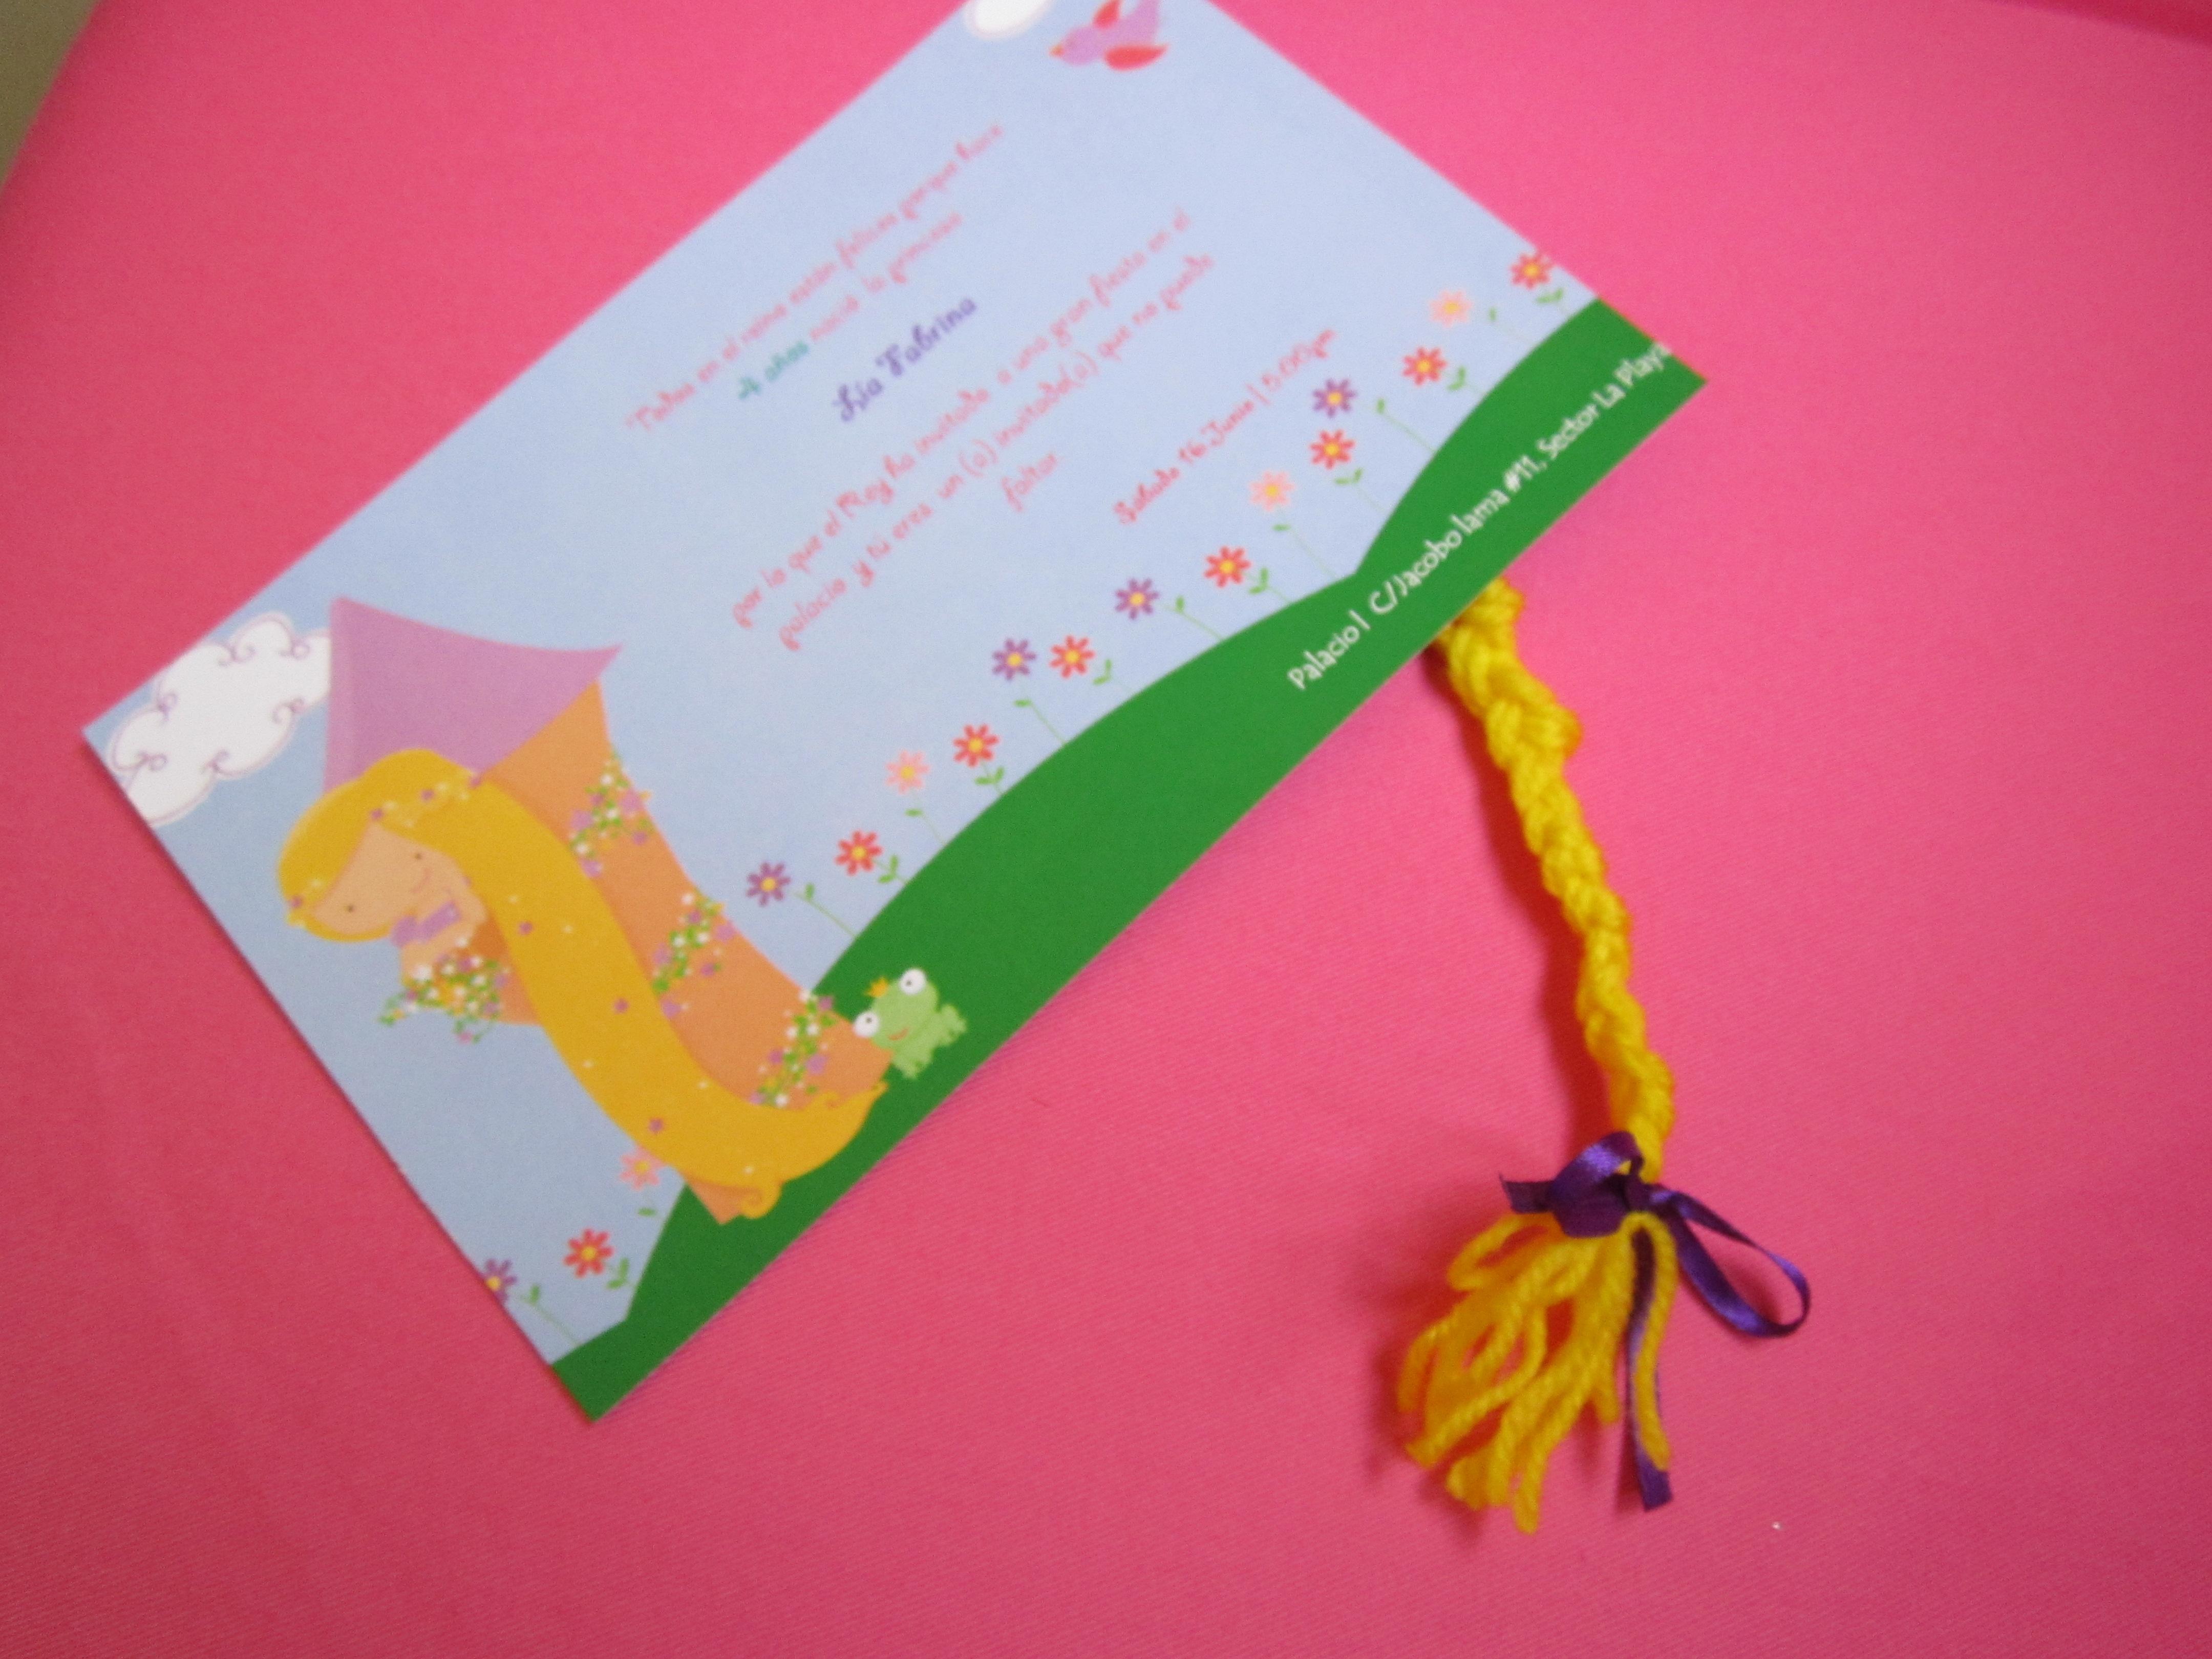 Rapunzel tarjeta | Cumpleaños | Nana Deco ideas | interiores | eventos